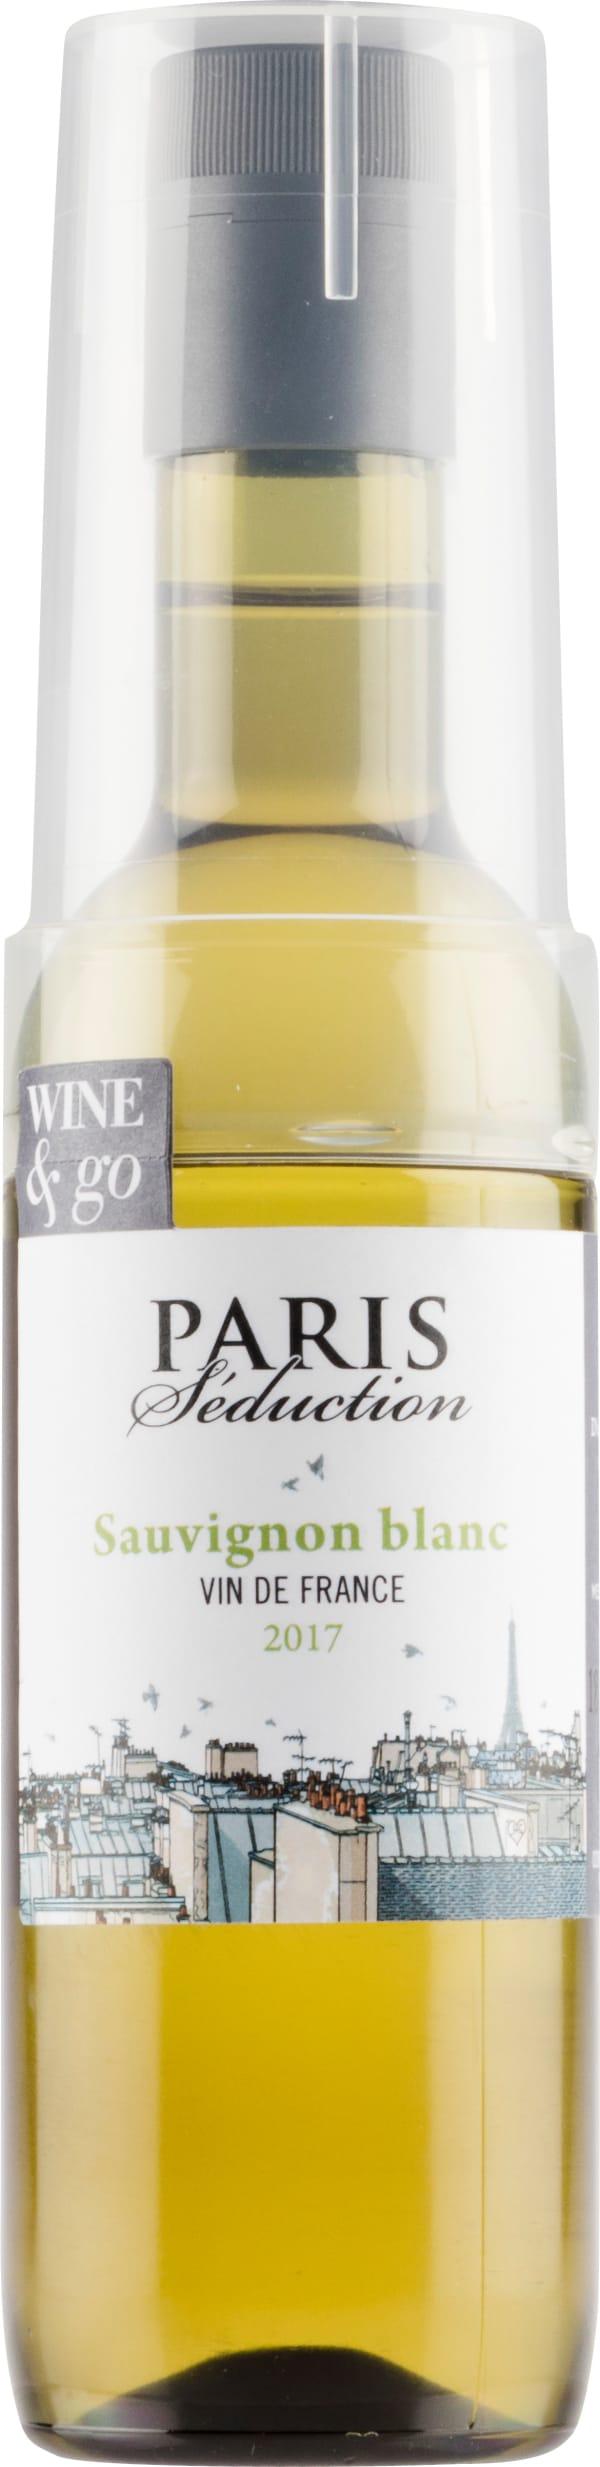 Paris Seduction Sauvignon Blanc 2017 plastic bottle